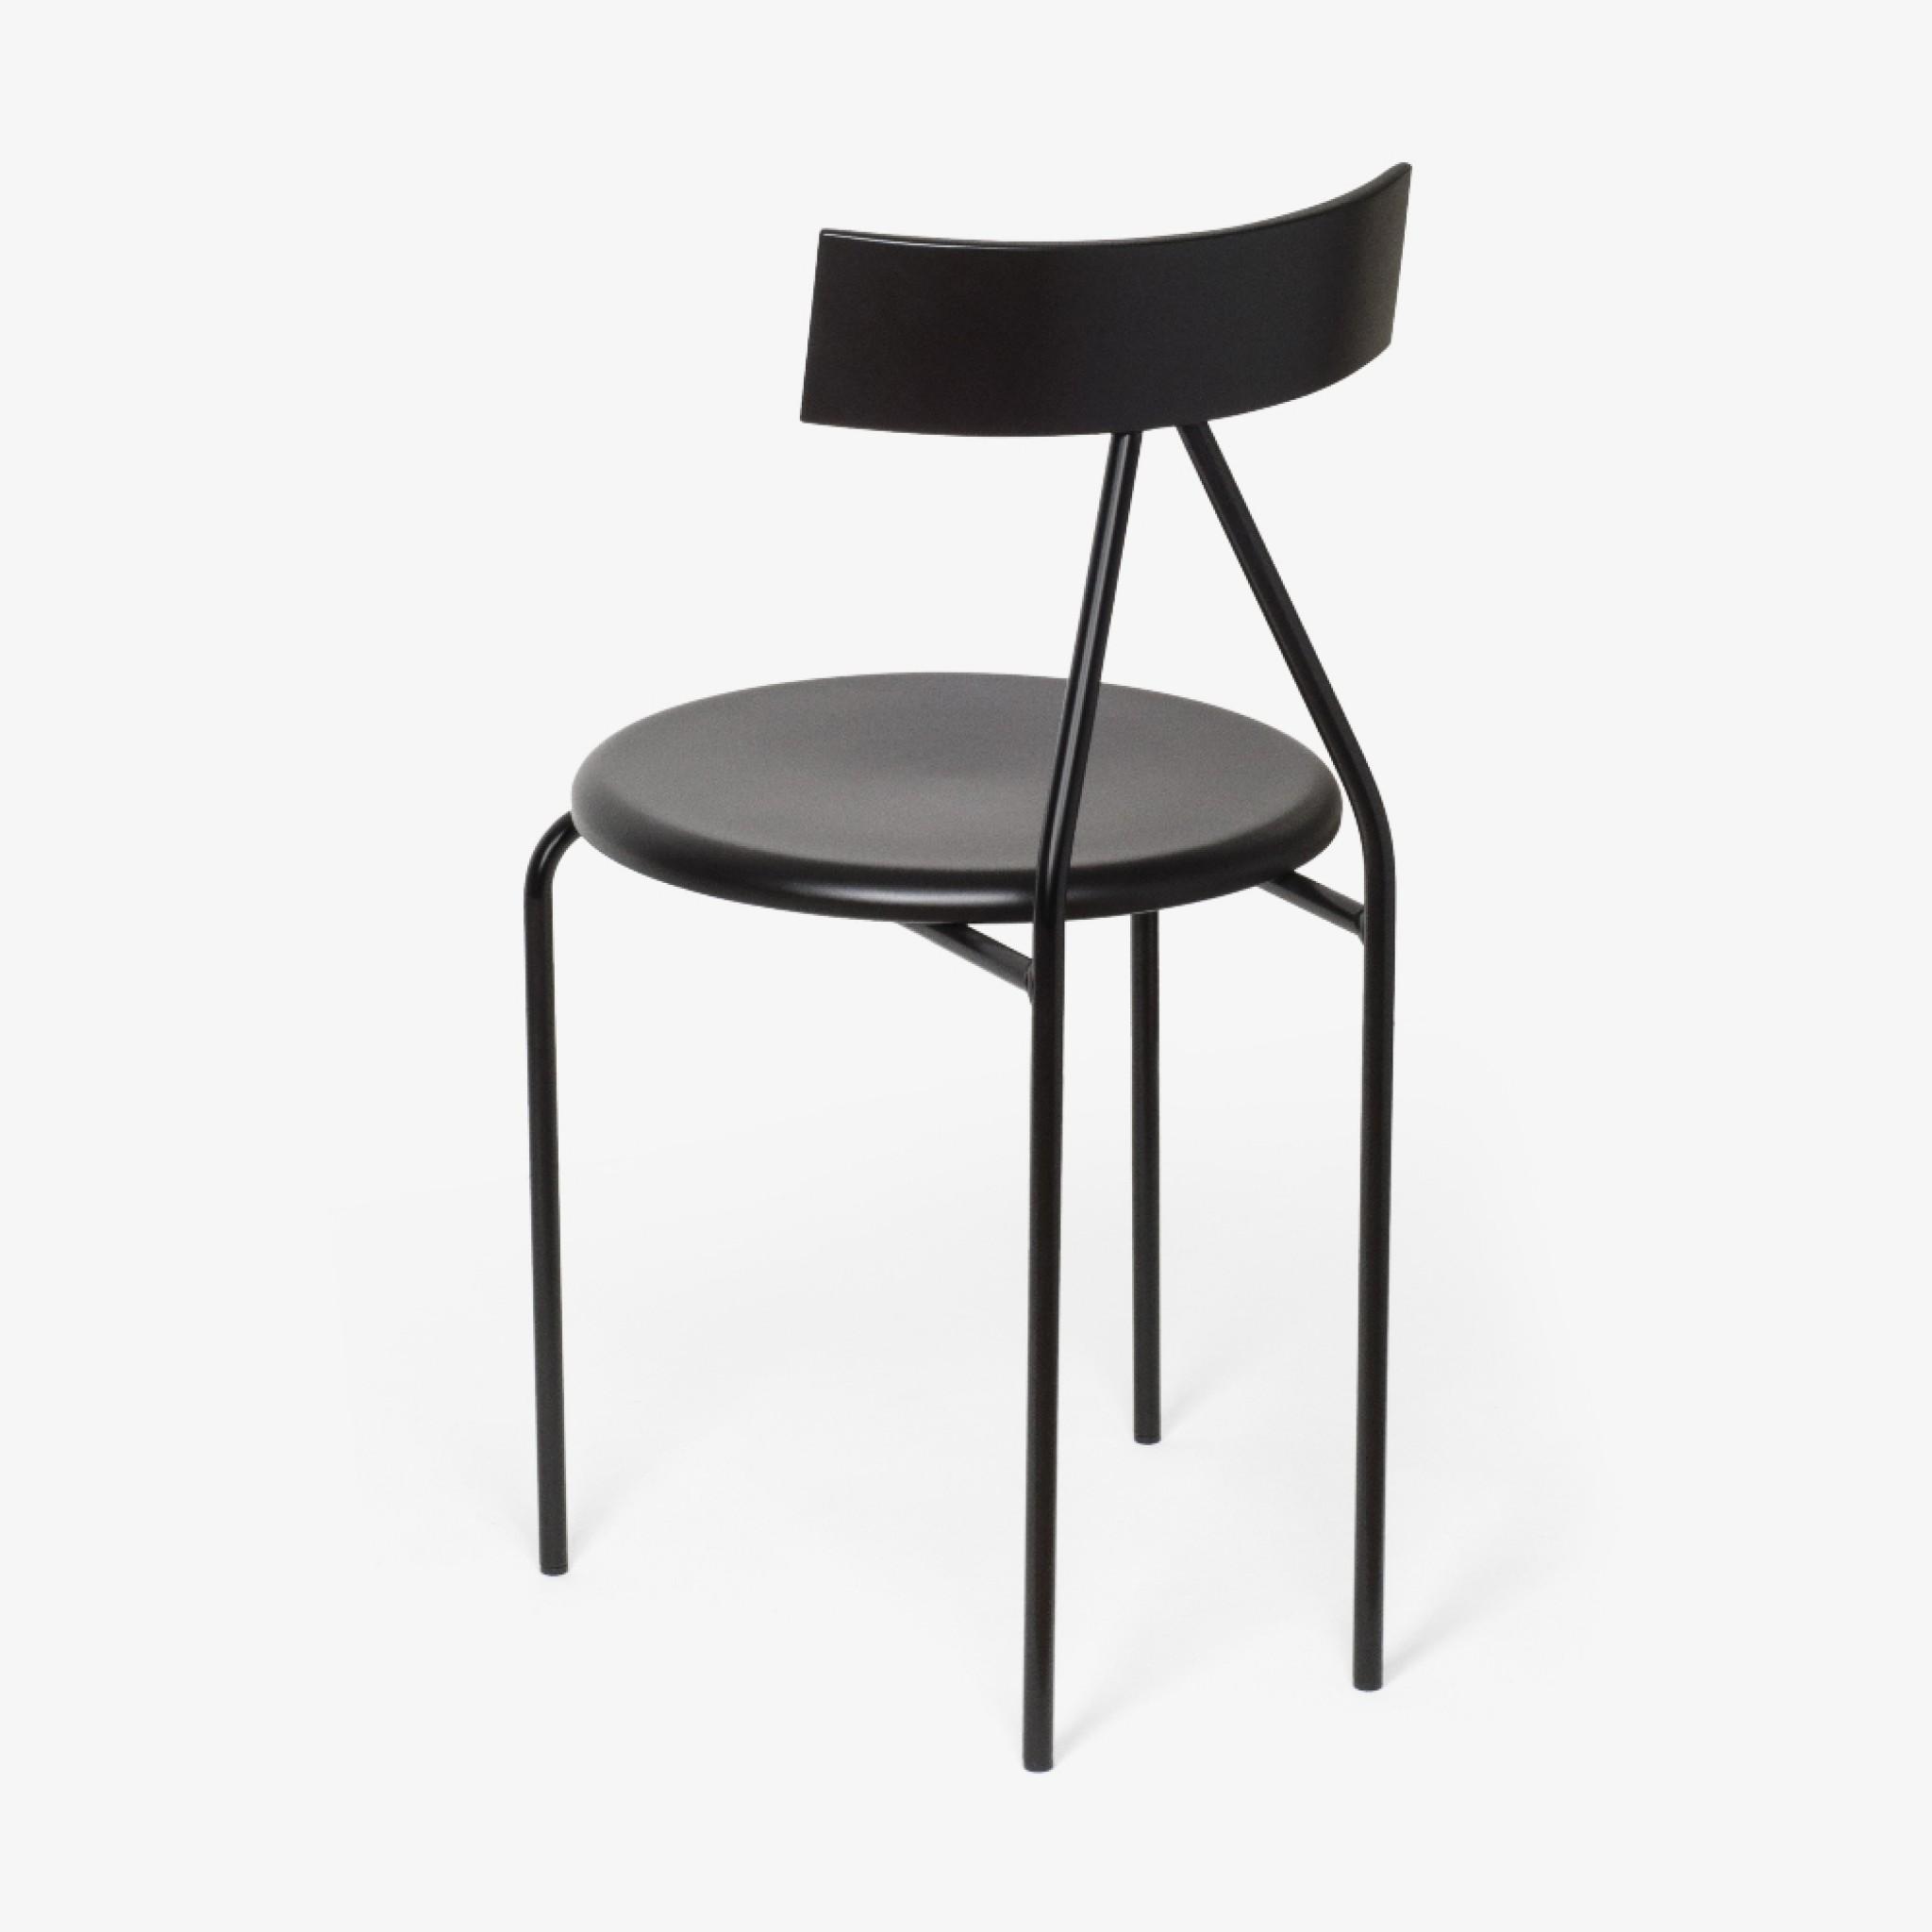 Gofi chair